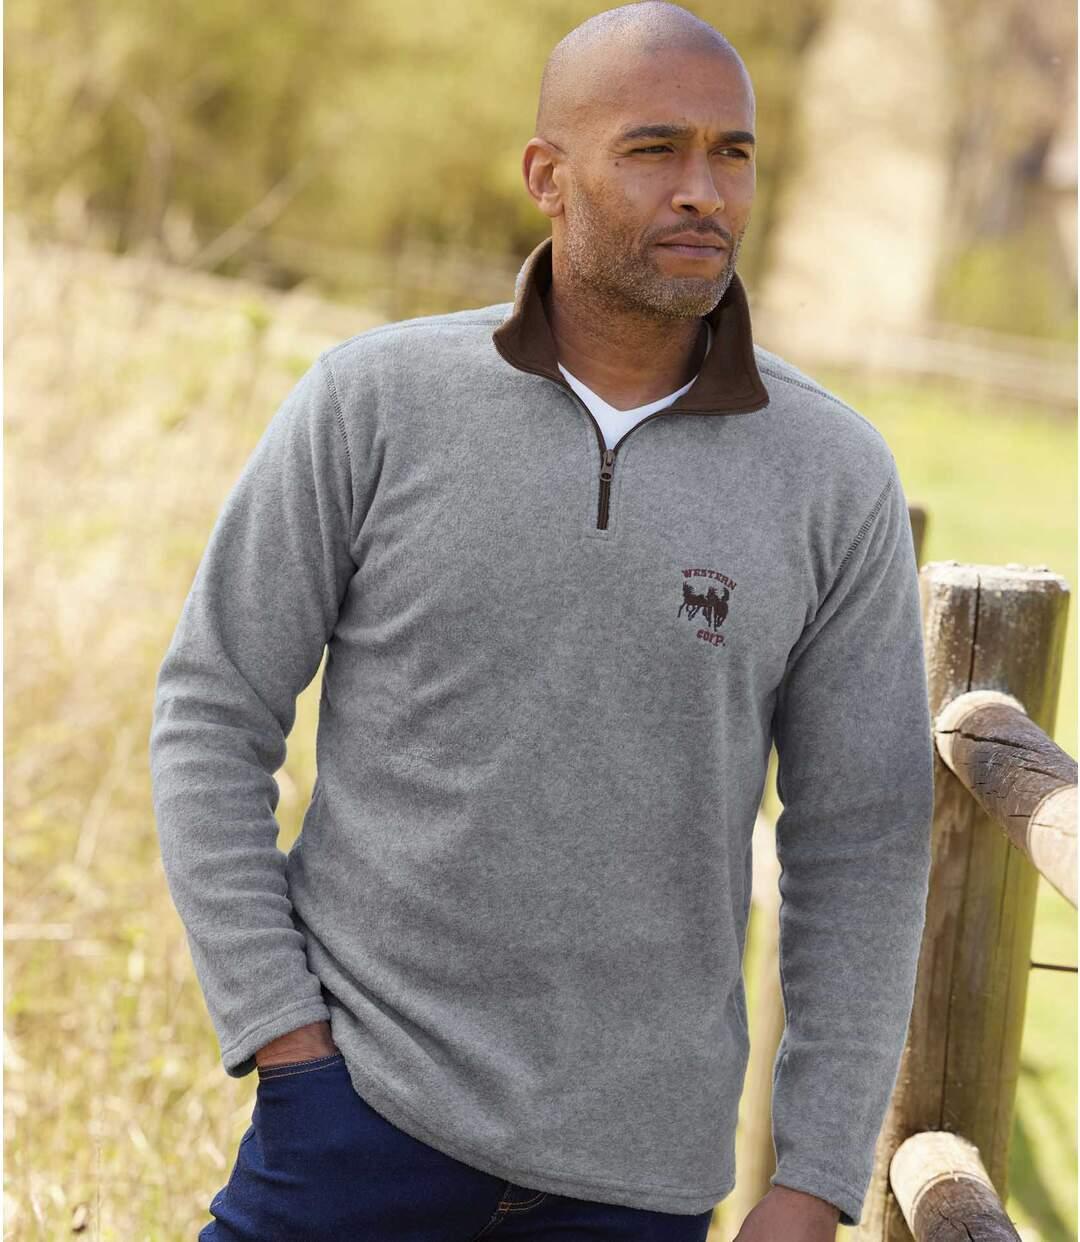 Pack of 2 Men's Fleece Pullovers - Gray and Navy Atlas For Men